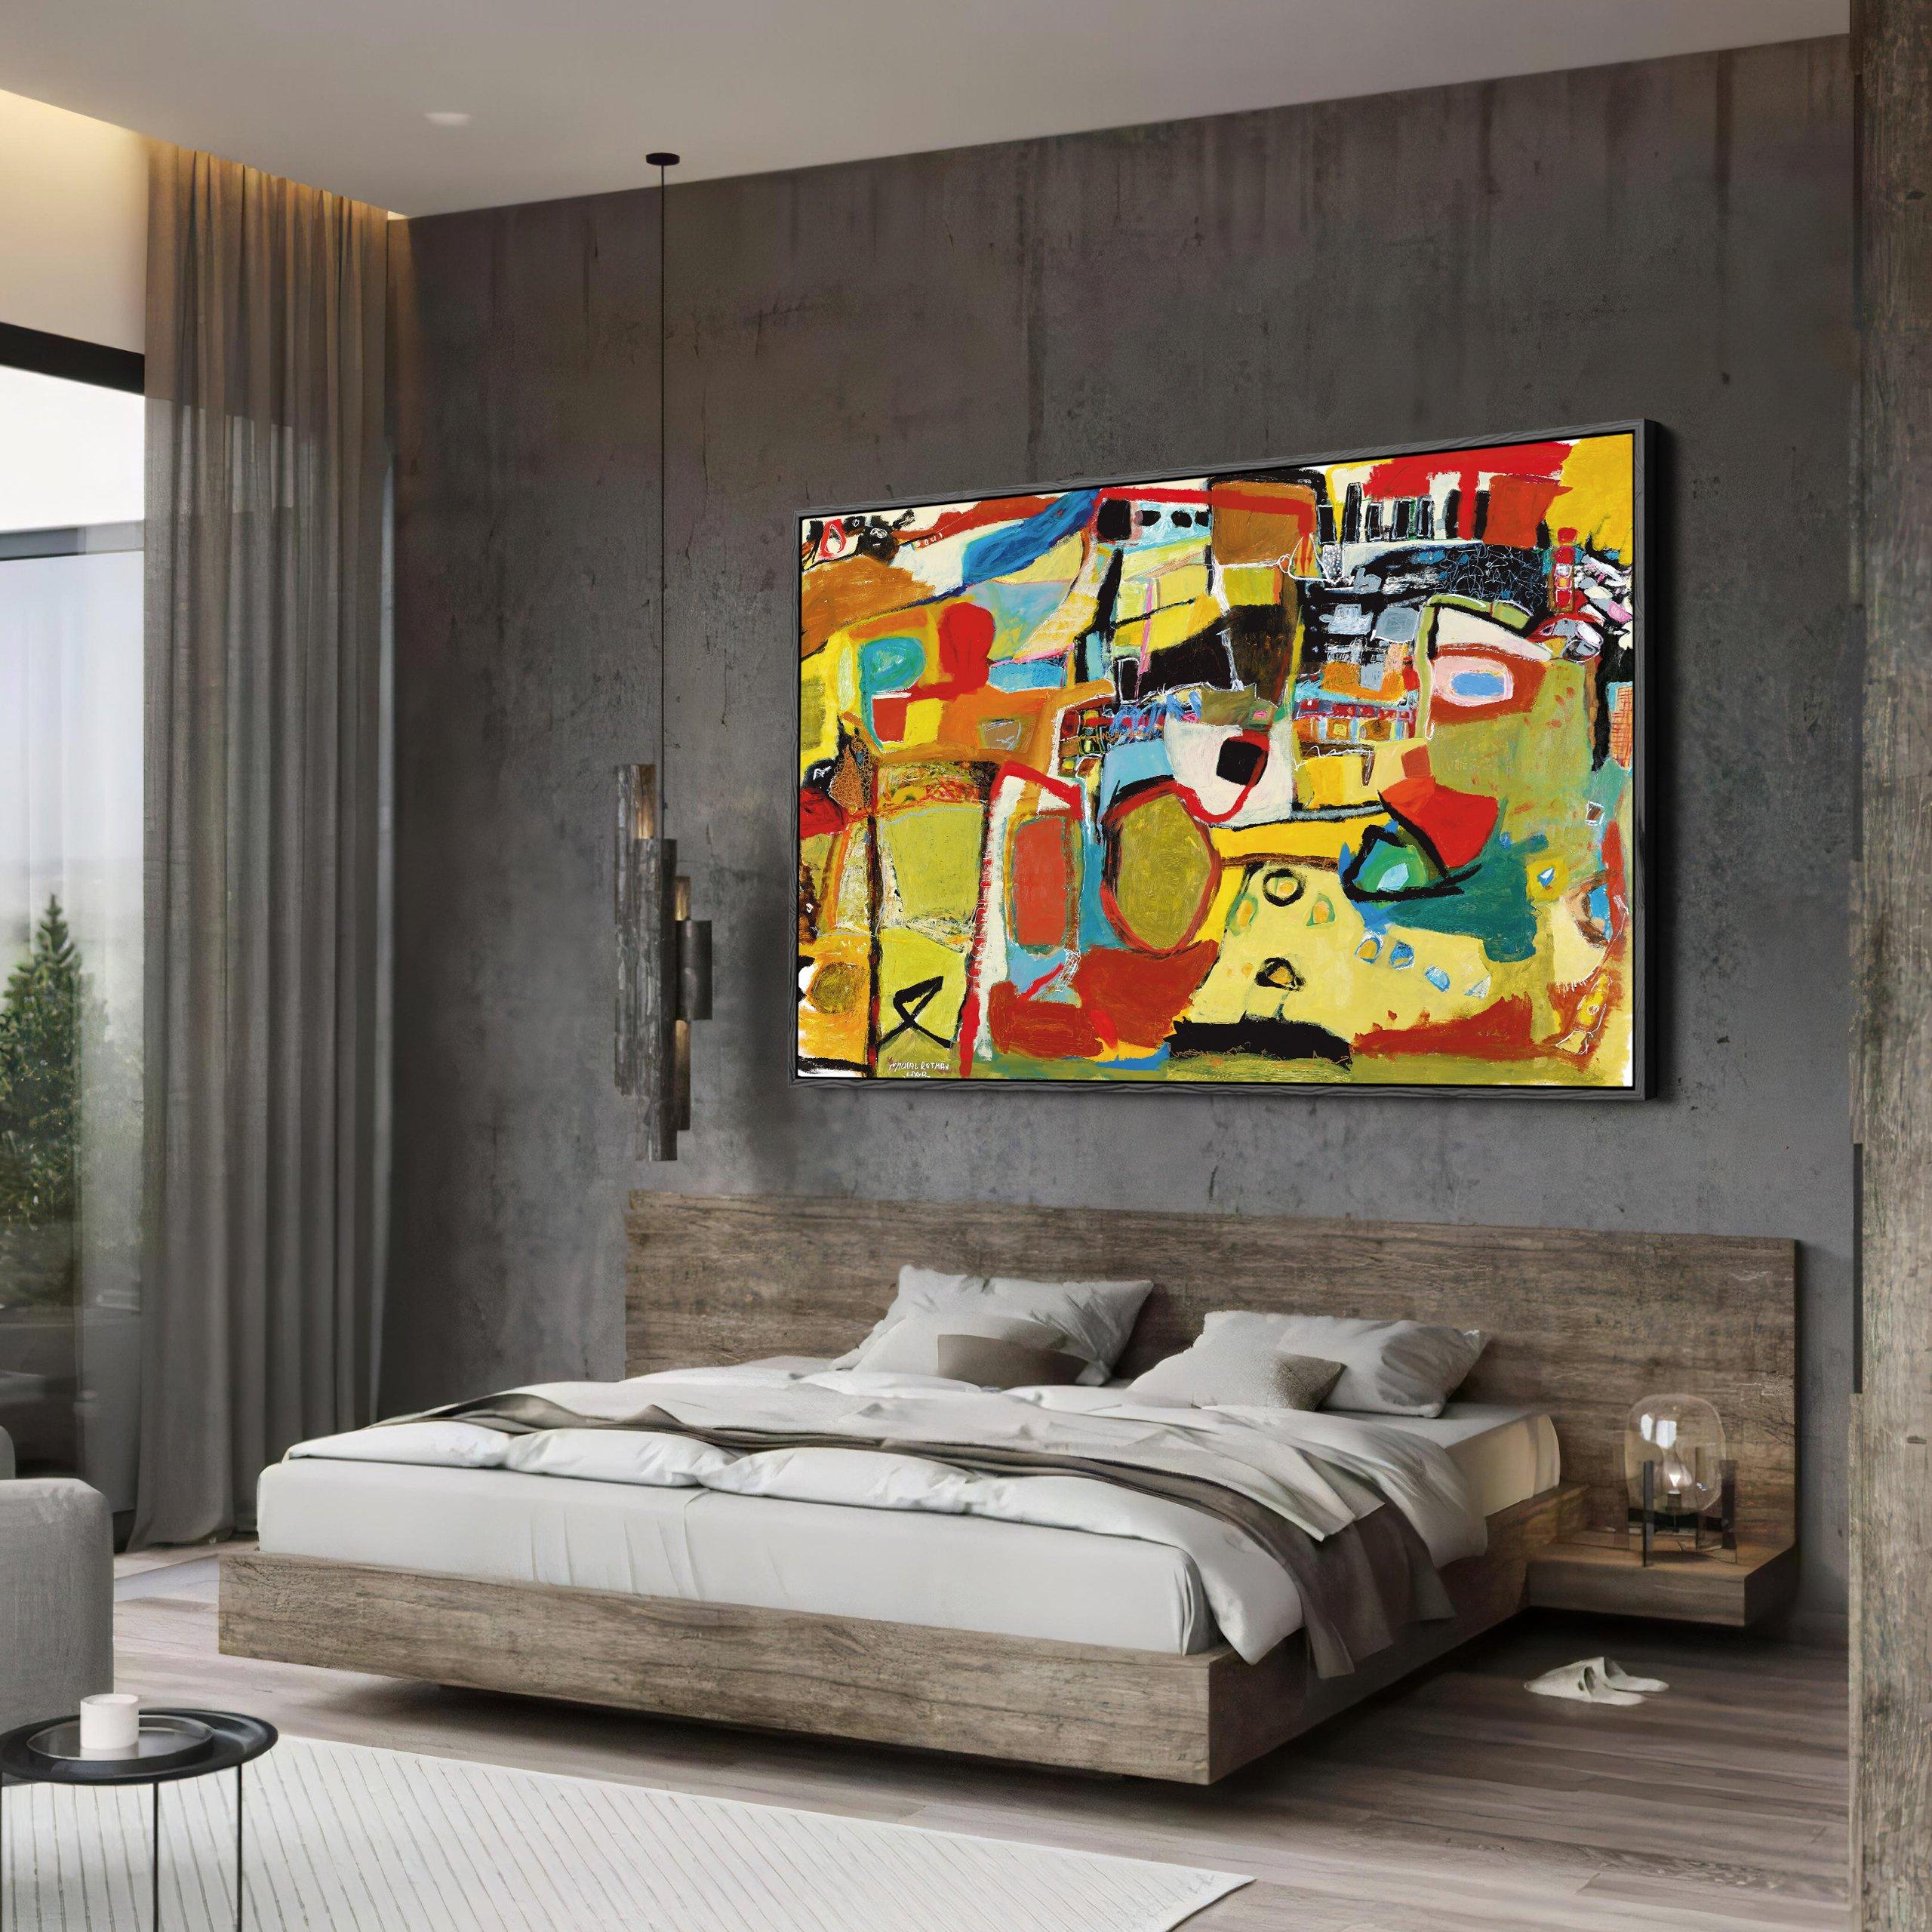 michal-rotman-laor-b-2-livingroom-painting